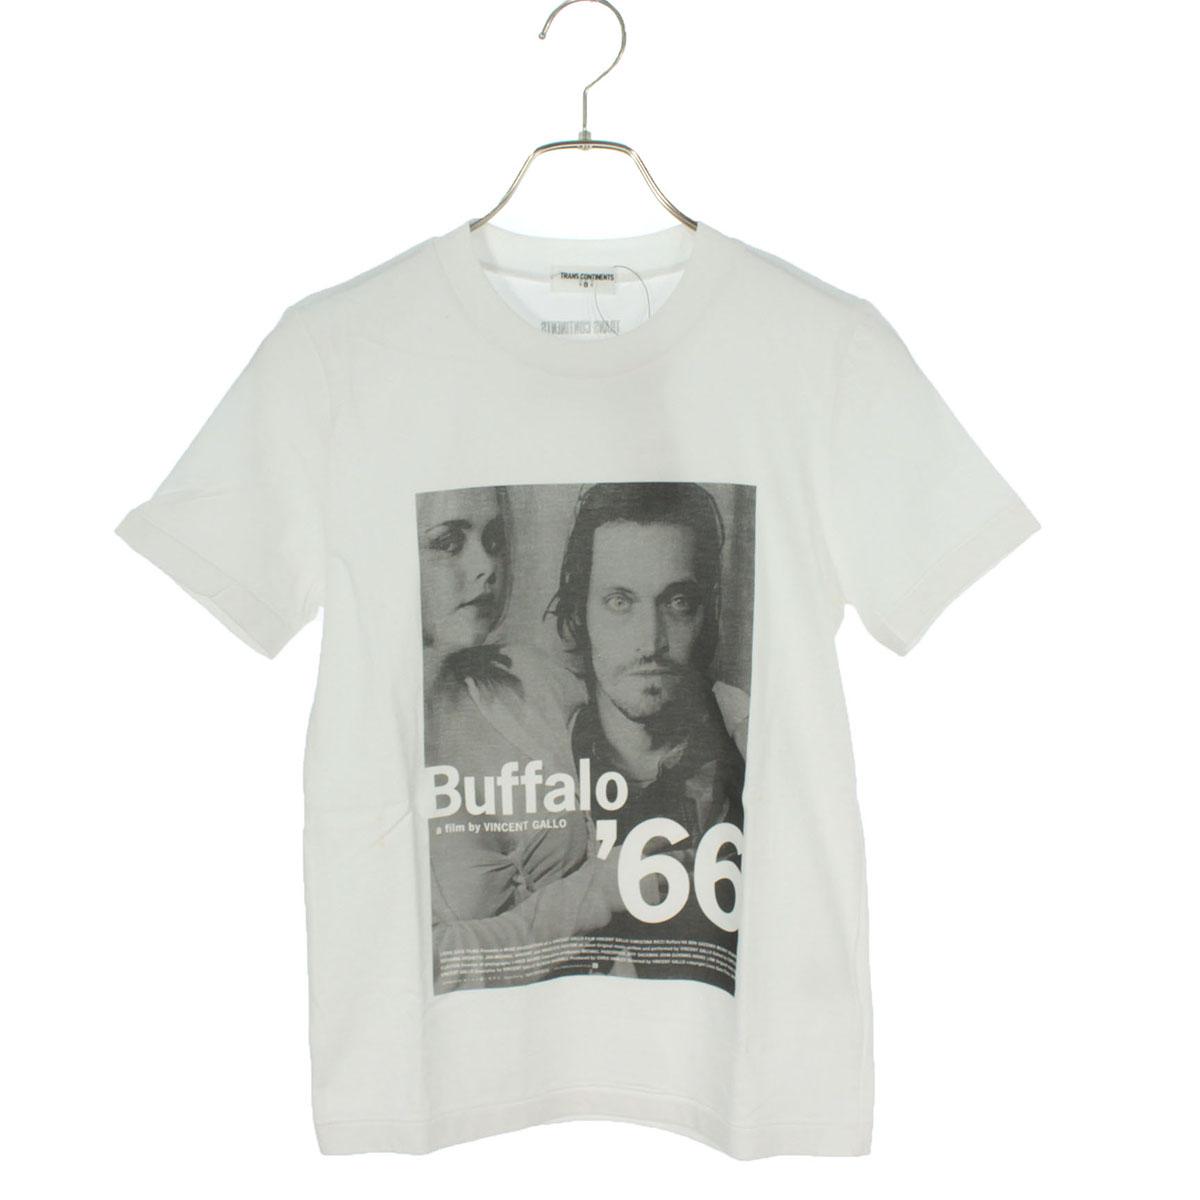 90s ヴィンセントギャロ バッファロー66 デッドストック シャツ